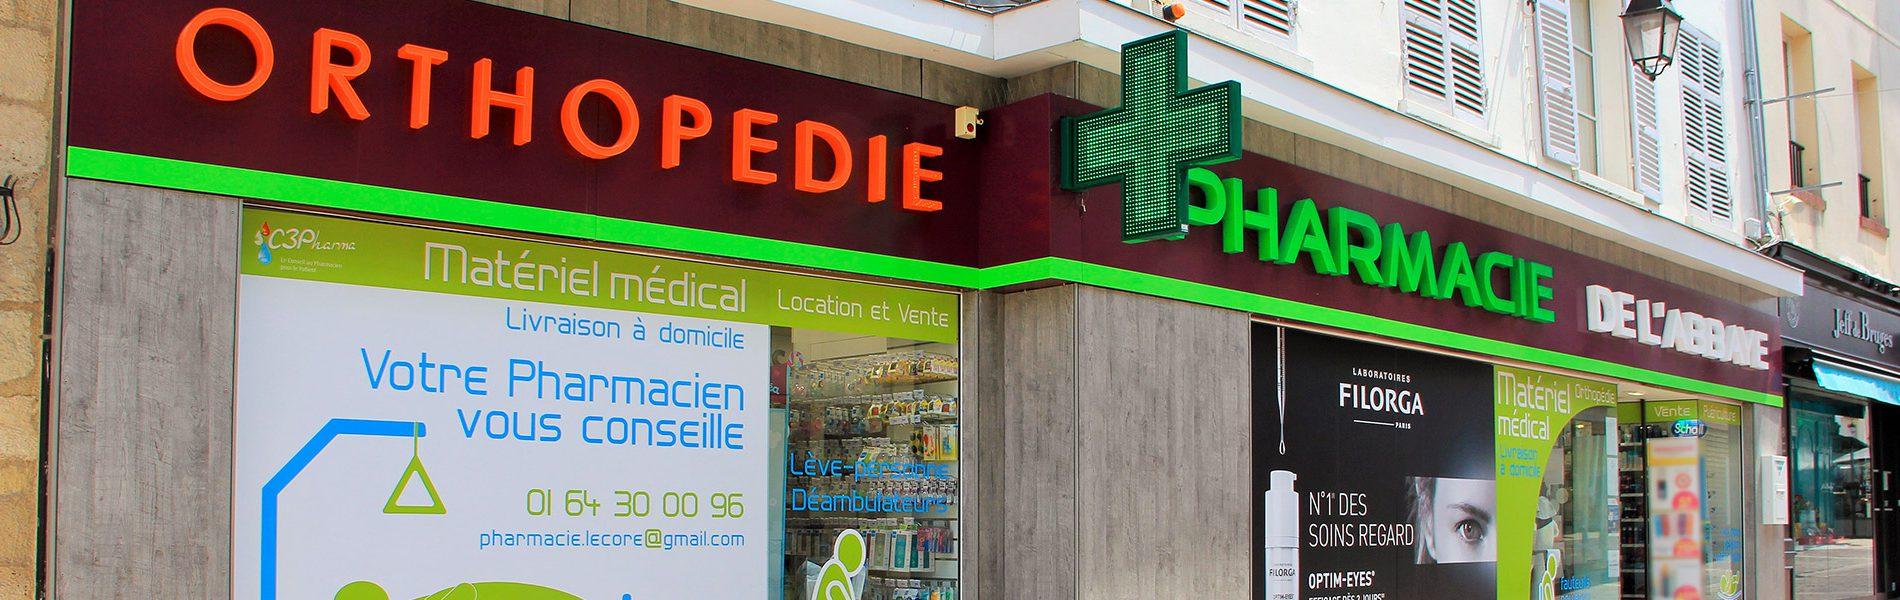 Pharmacie DE L'ABBAYE - Image Homepage 2